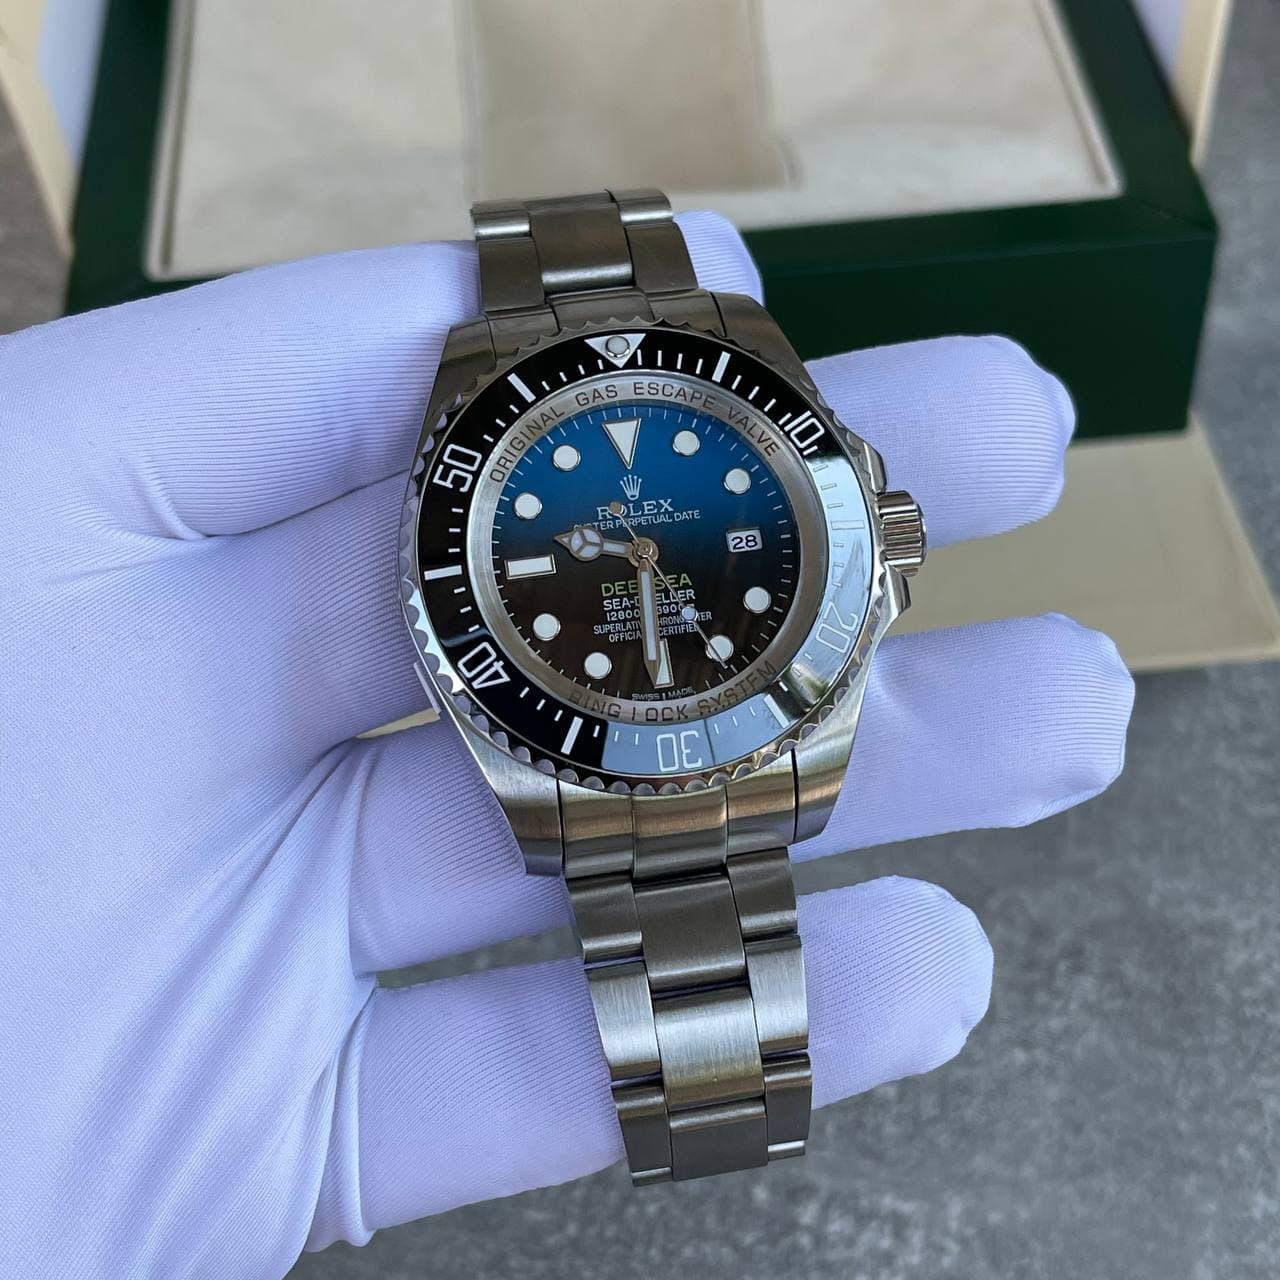 Наручний годинник Rolex Deepsea Sea-Dweller Silver-Black-Blue преміального класу ААА